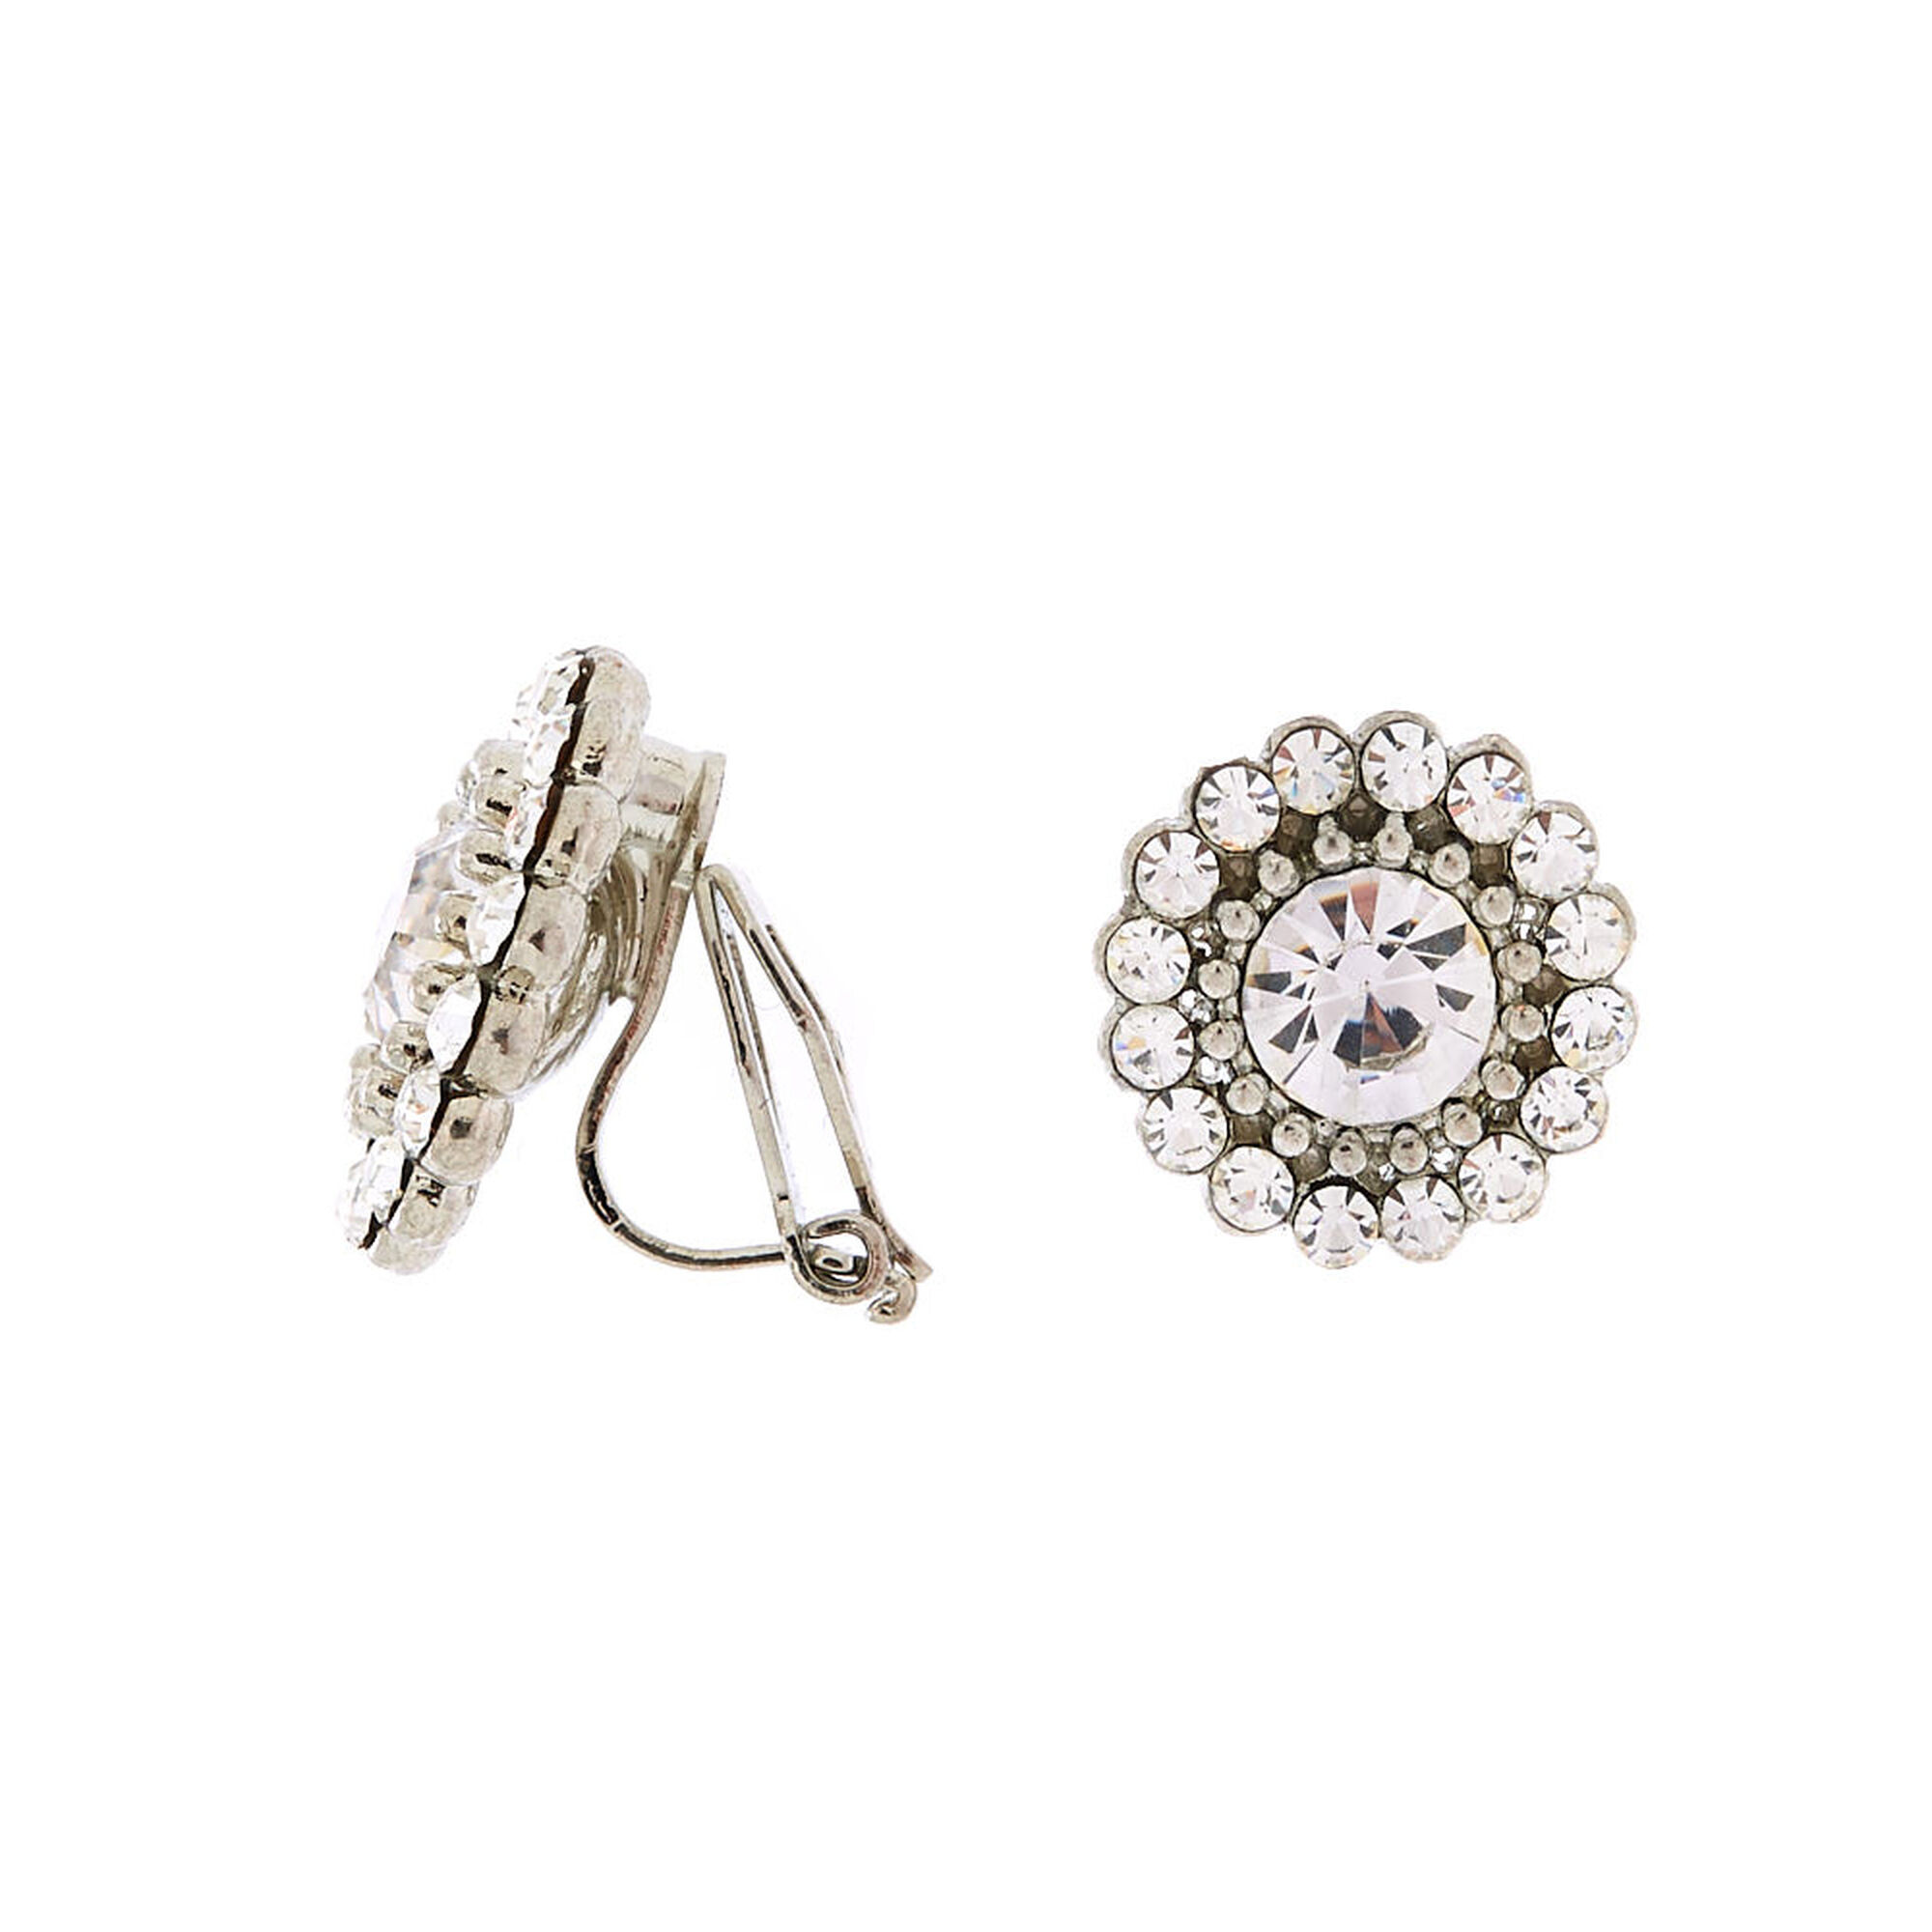 Silver Crystal Clip On Stud Earrings